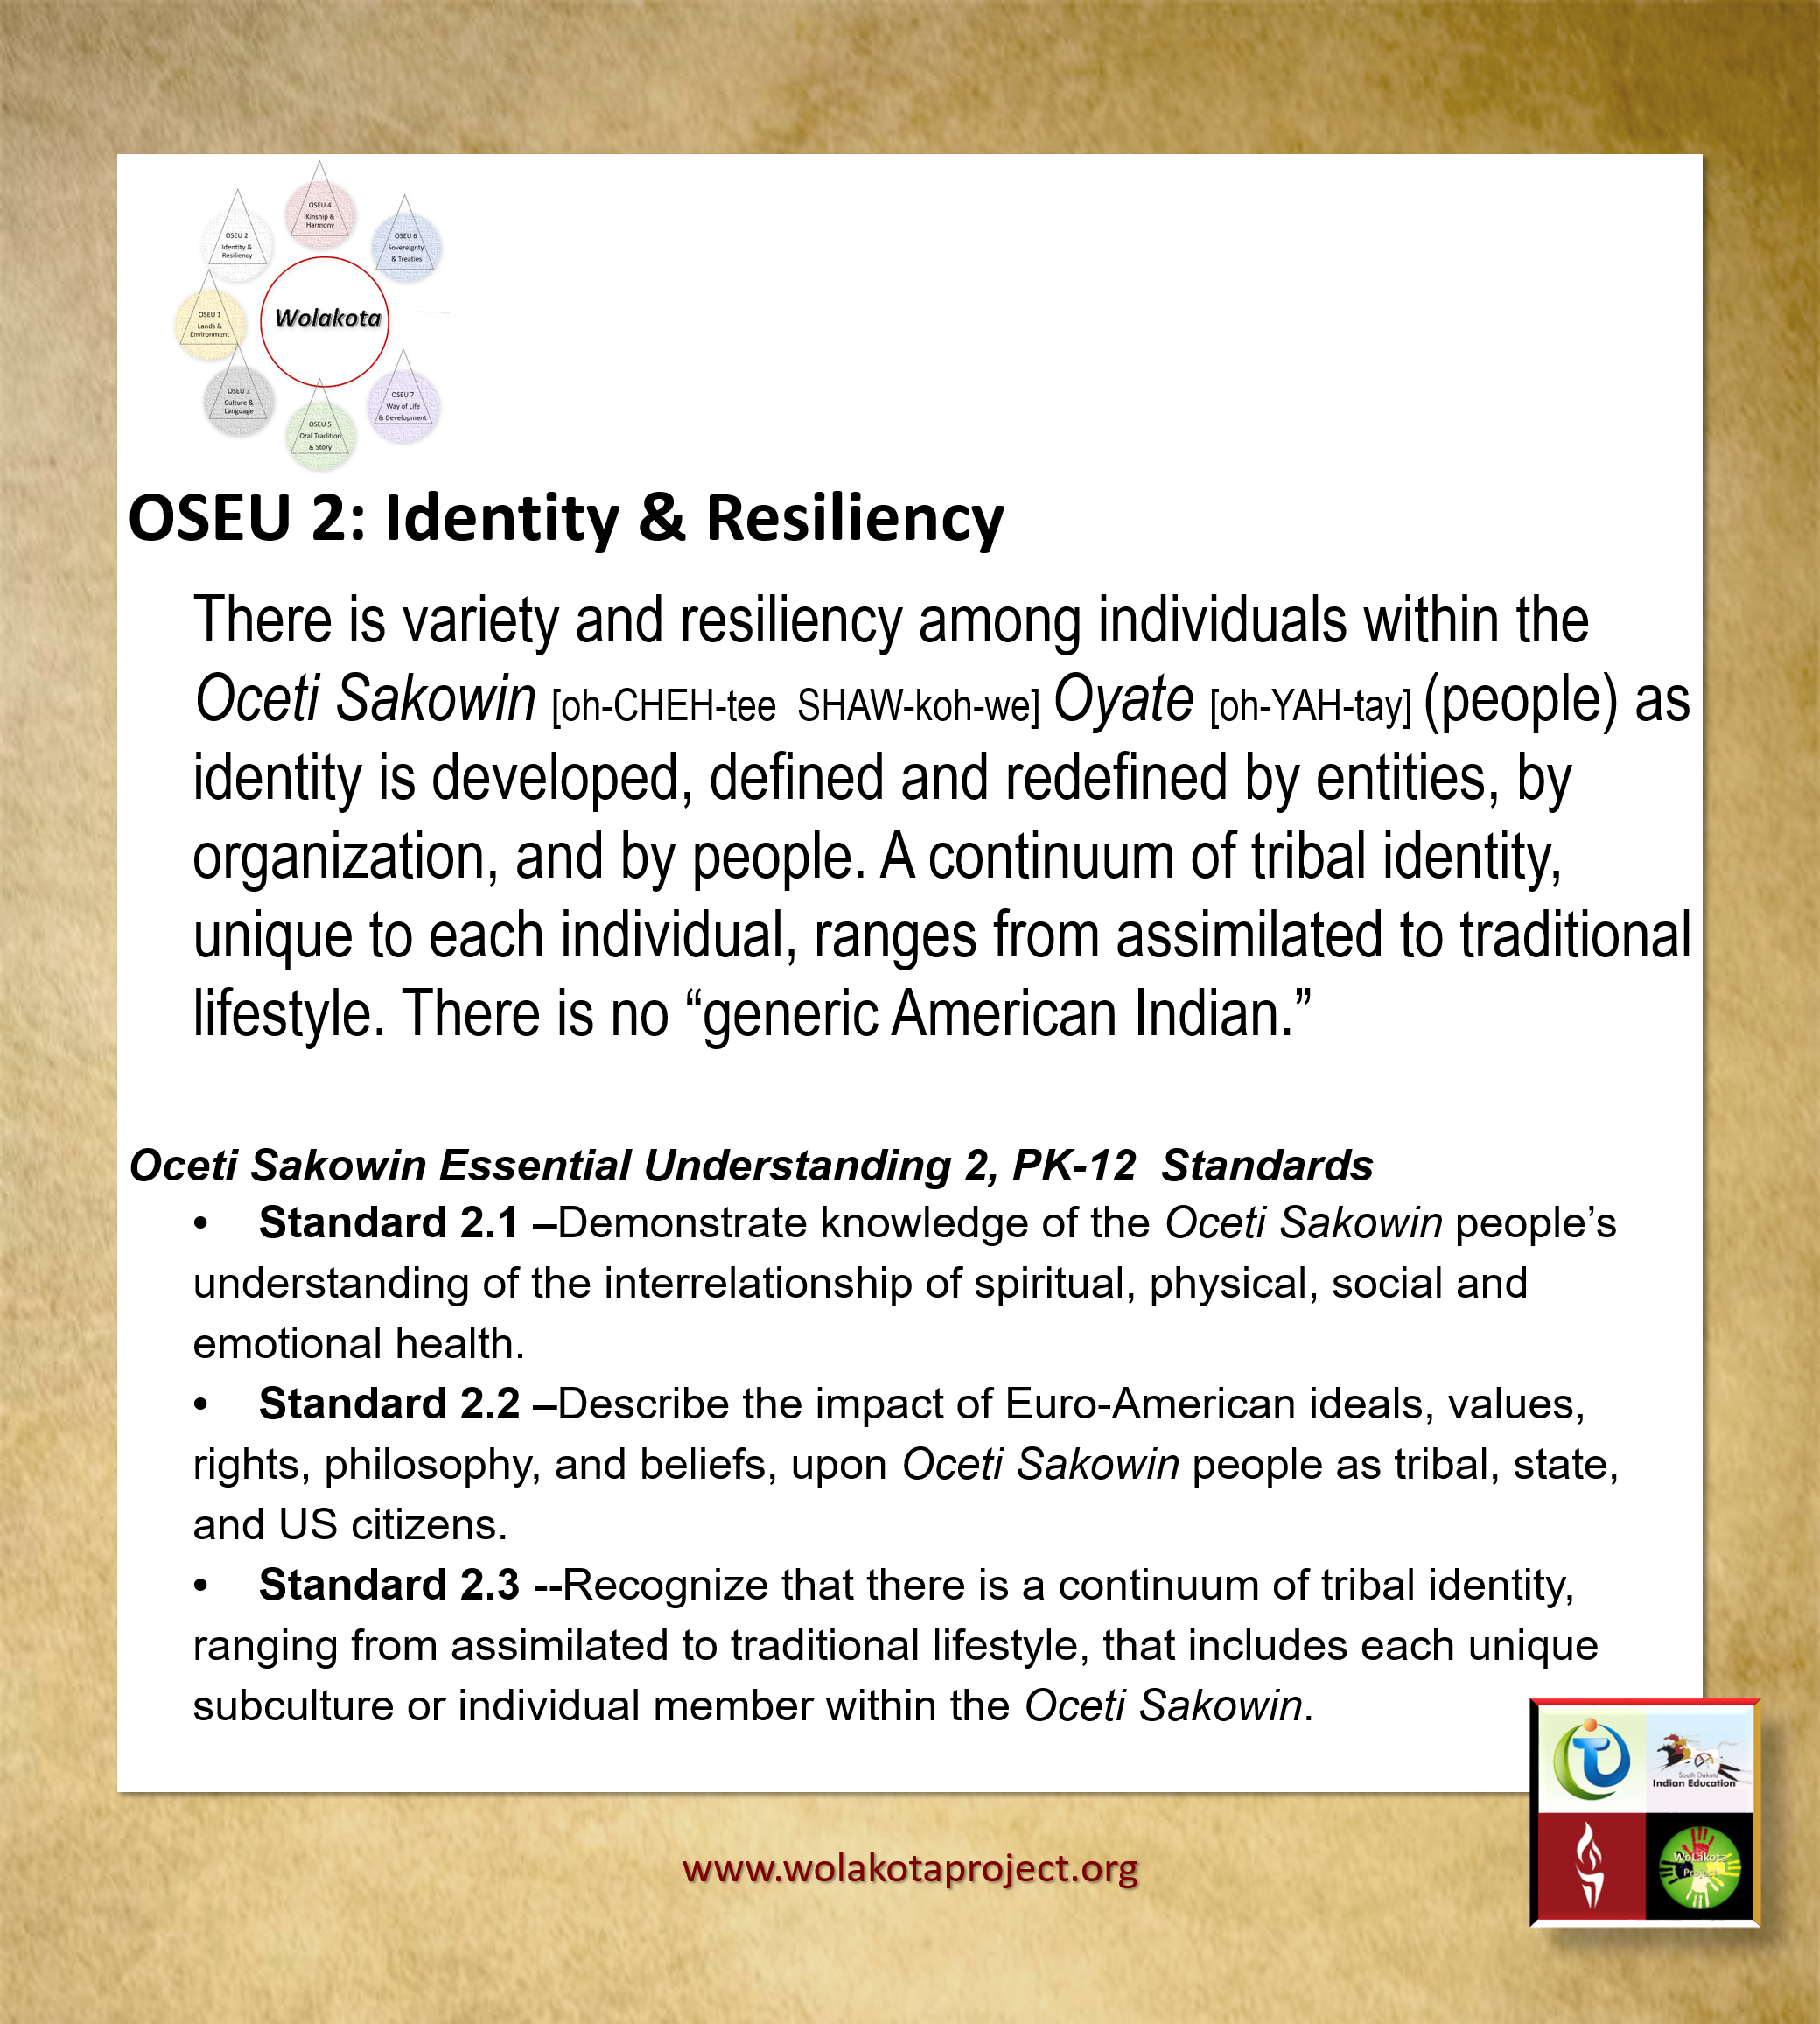 oseu-2-webpage-graphic